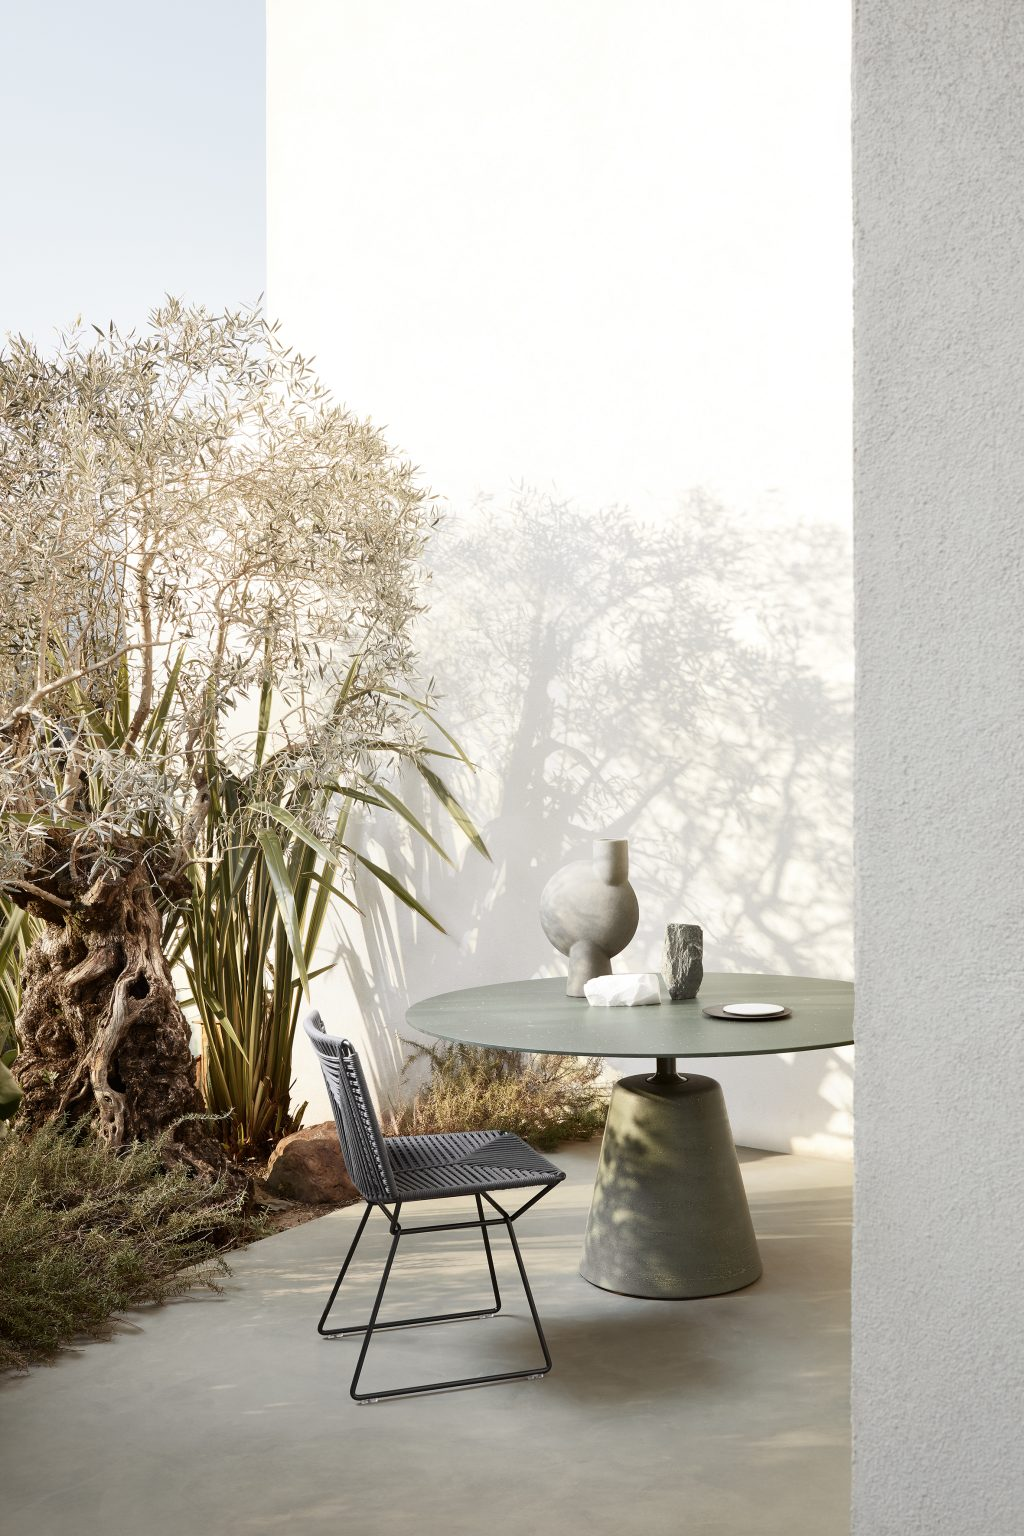 Biennale Interieur - Belgium's leading design and interior event - Neil-twist.jpg